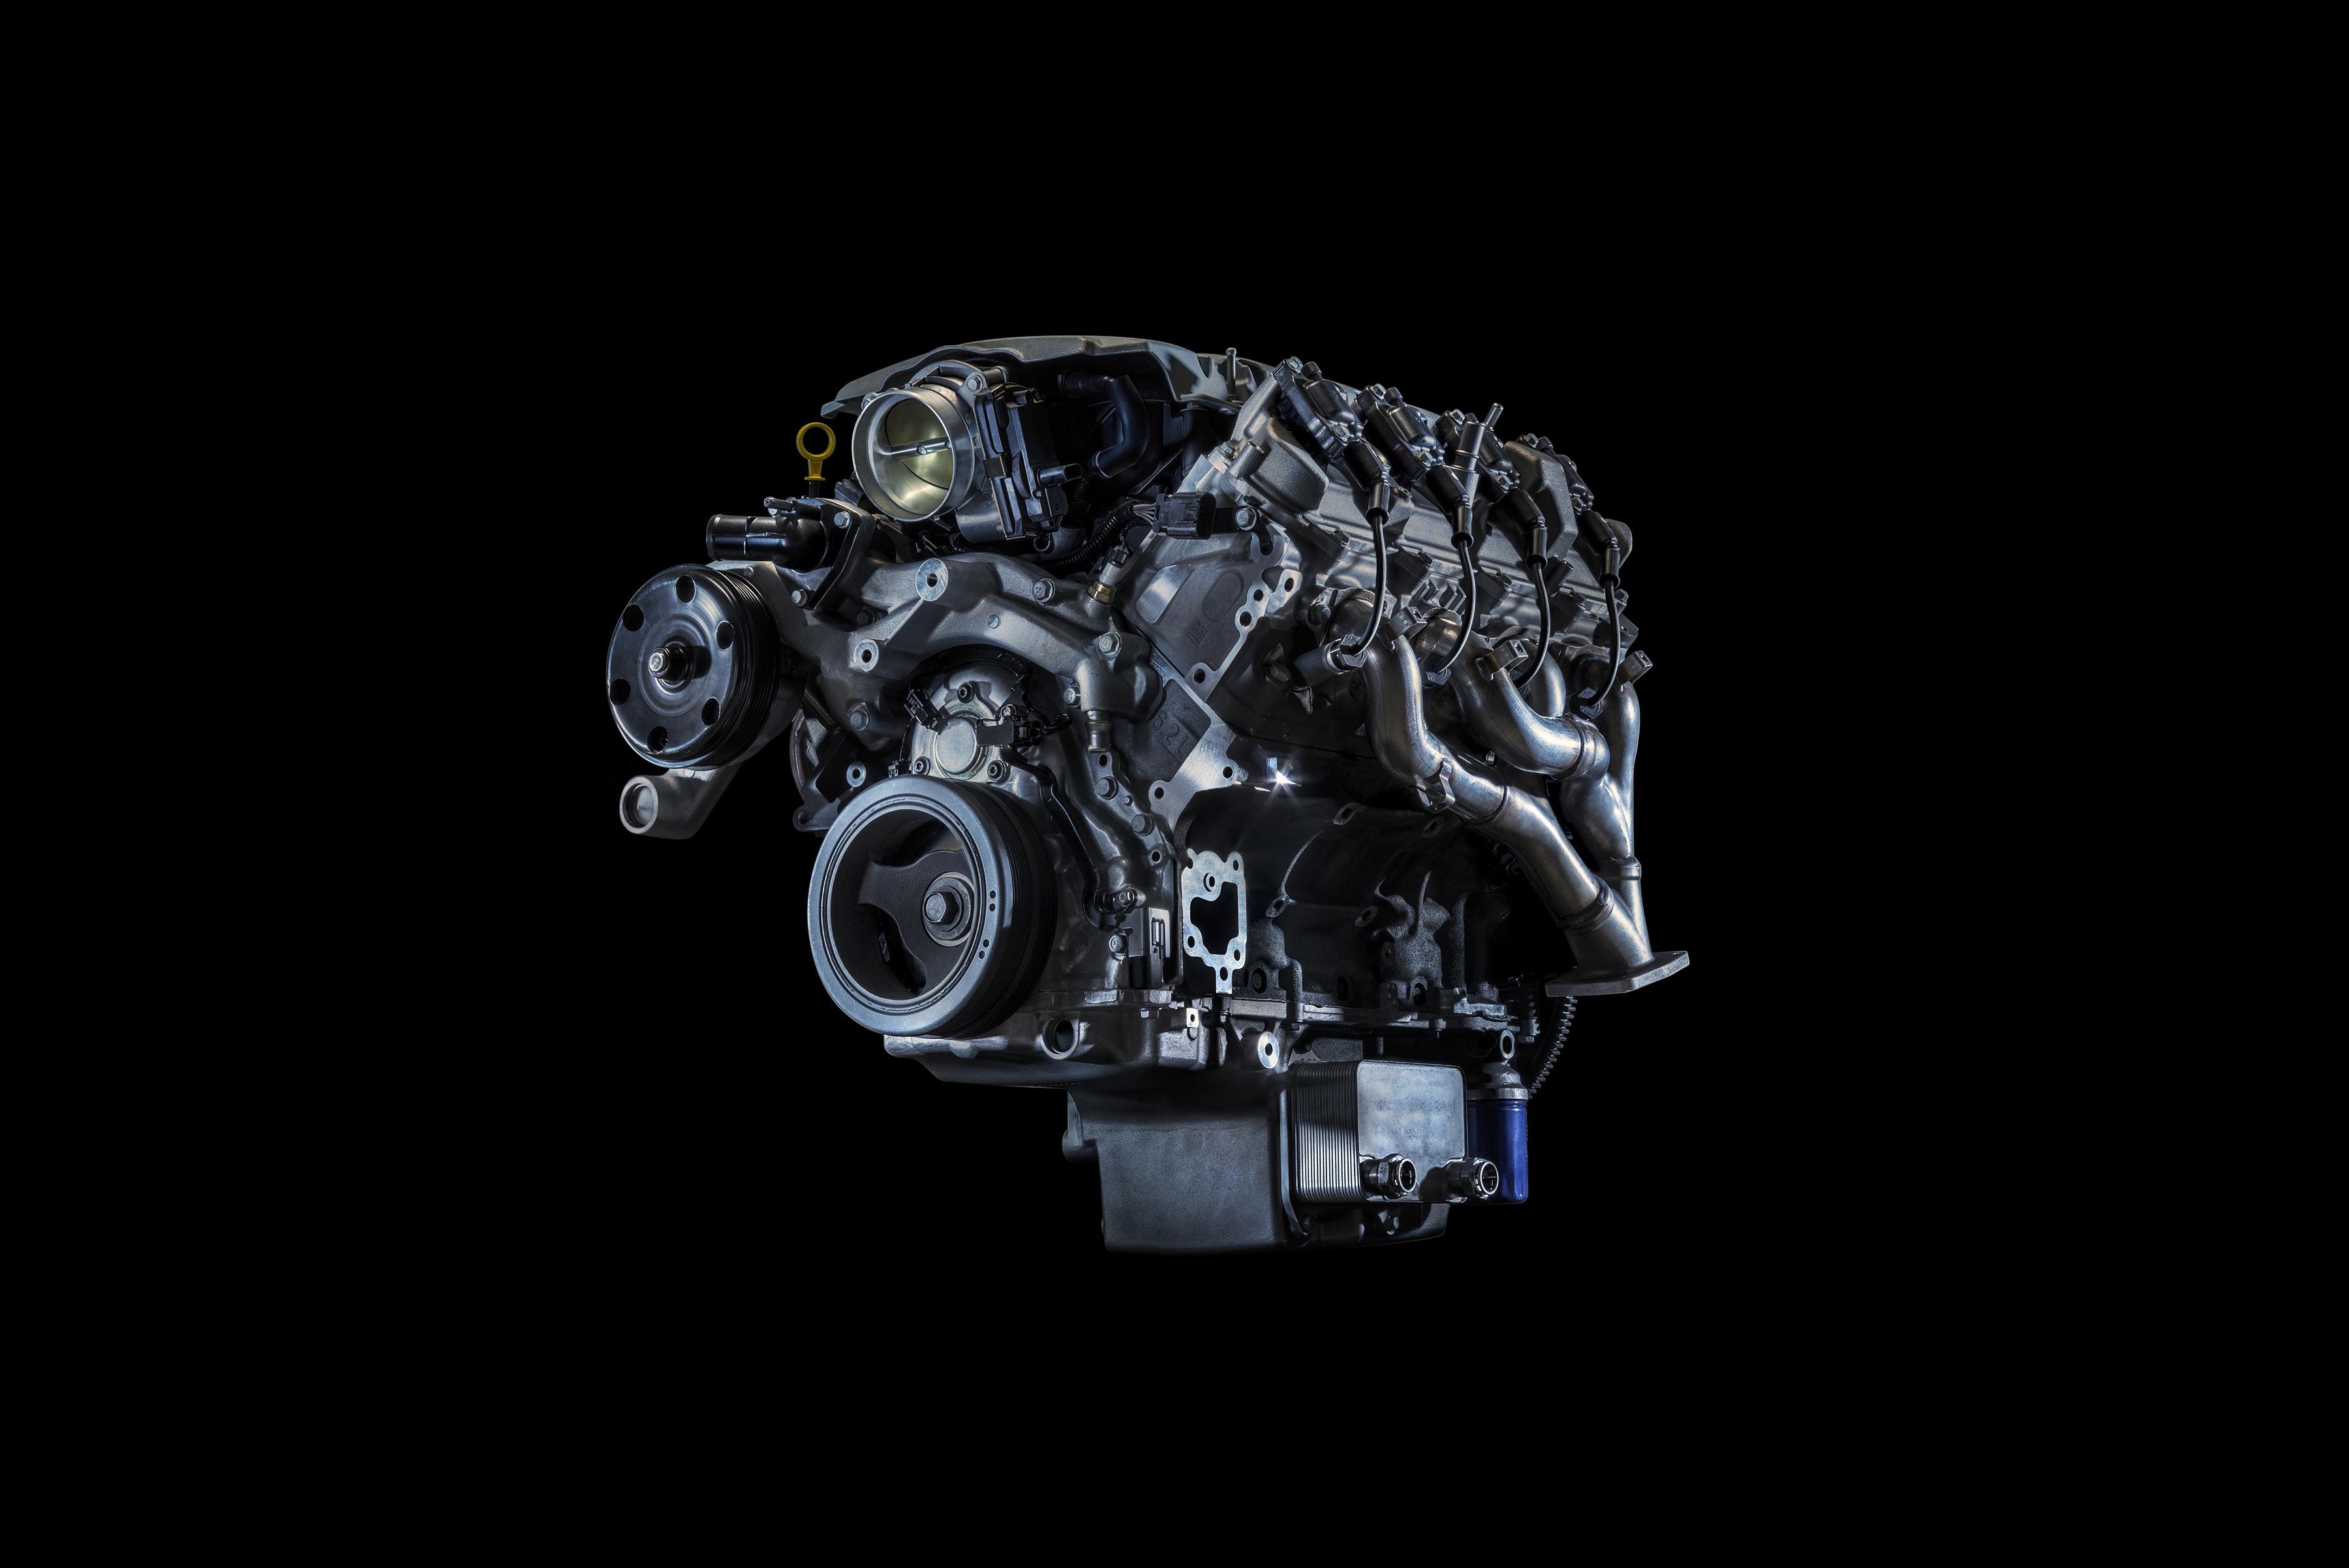 2016 Chevrolet Camaro - engine / moteur